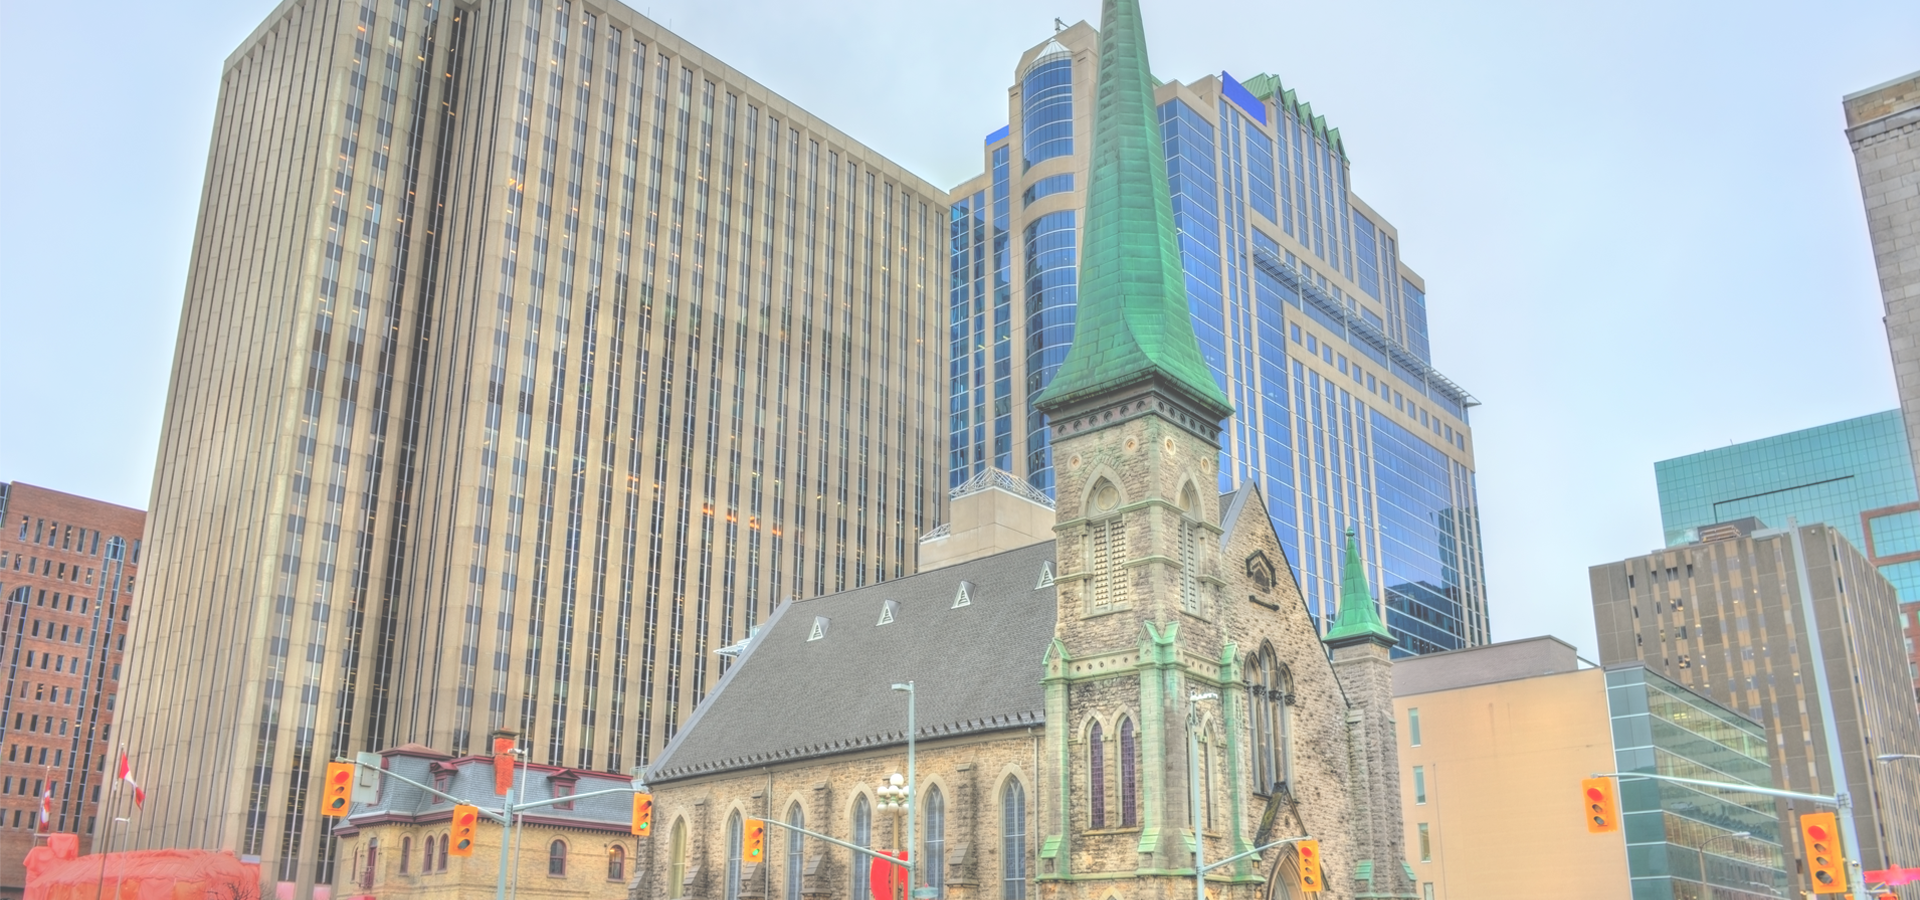 Peer-to-peer advisory in Ottawa, Ontario, Canada